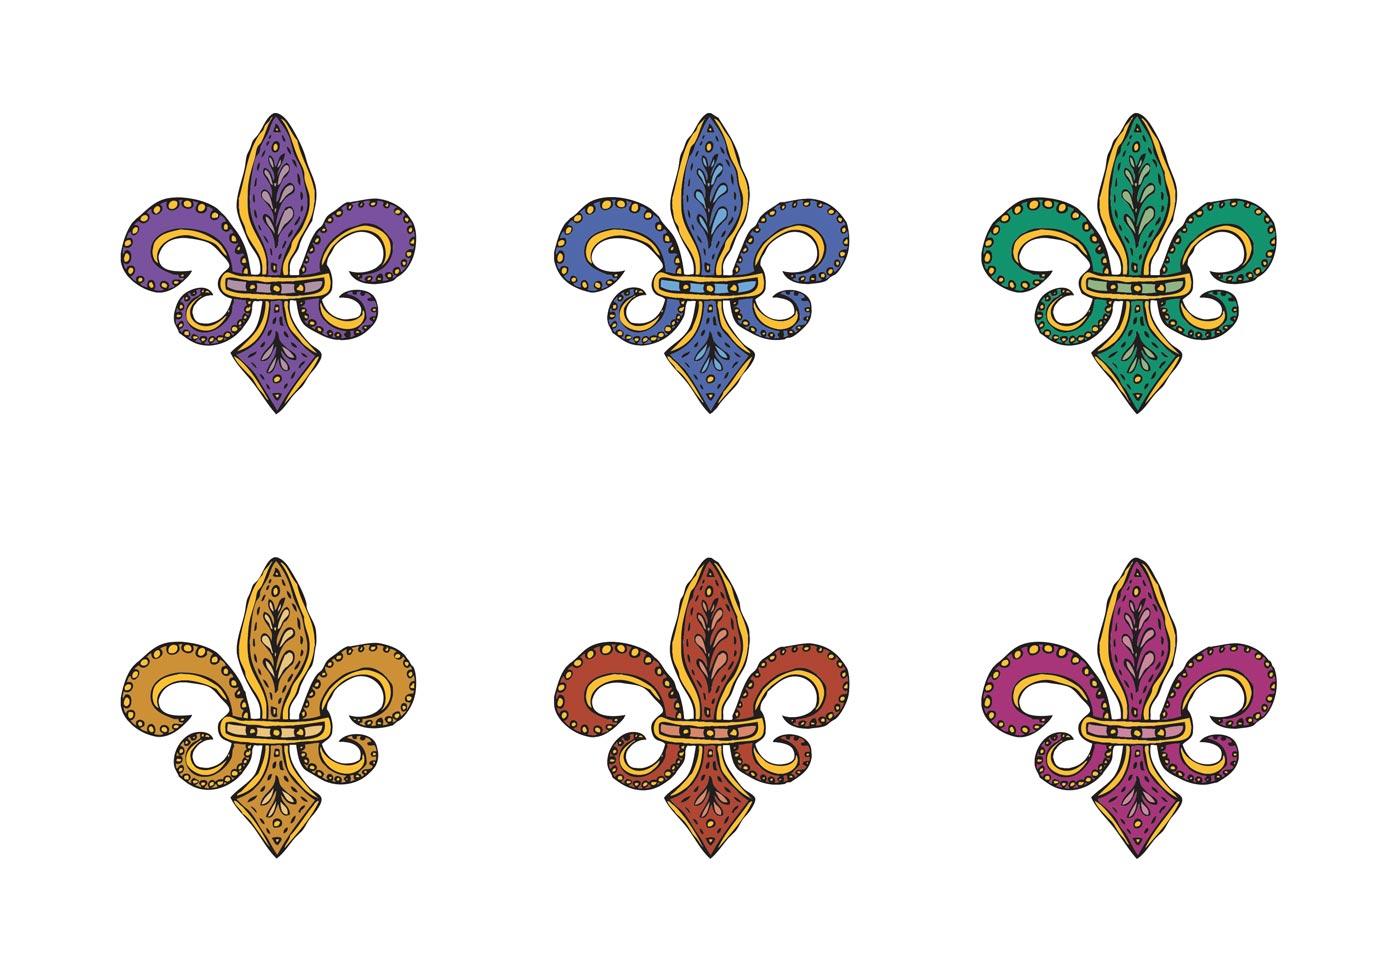 free fleur de lis vector series download free vector art fleur de lys vector illustration fleur de lys vector image